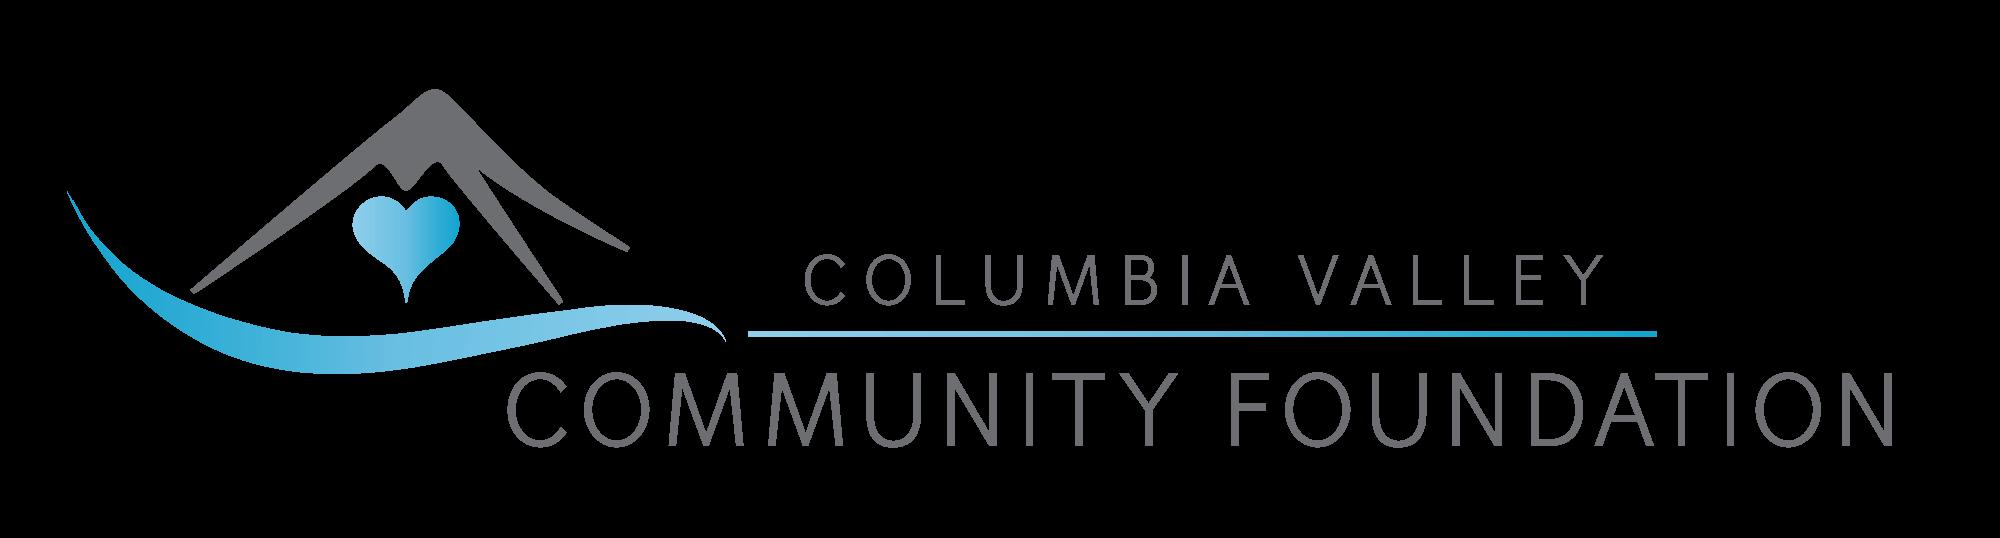 Columbia Valley Community Foundation logo